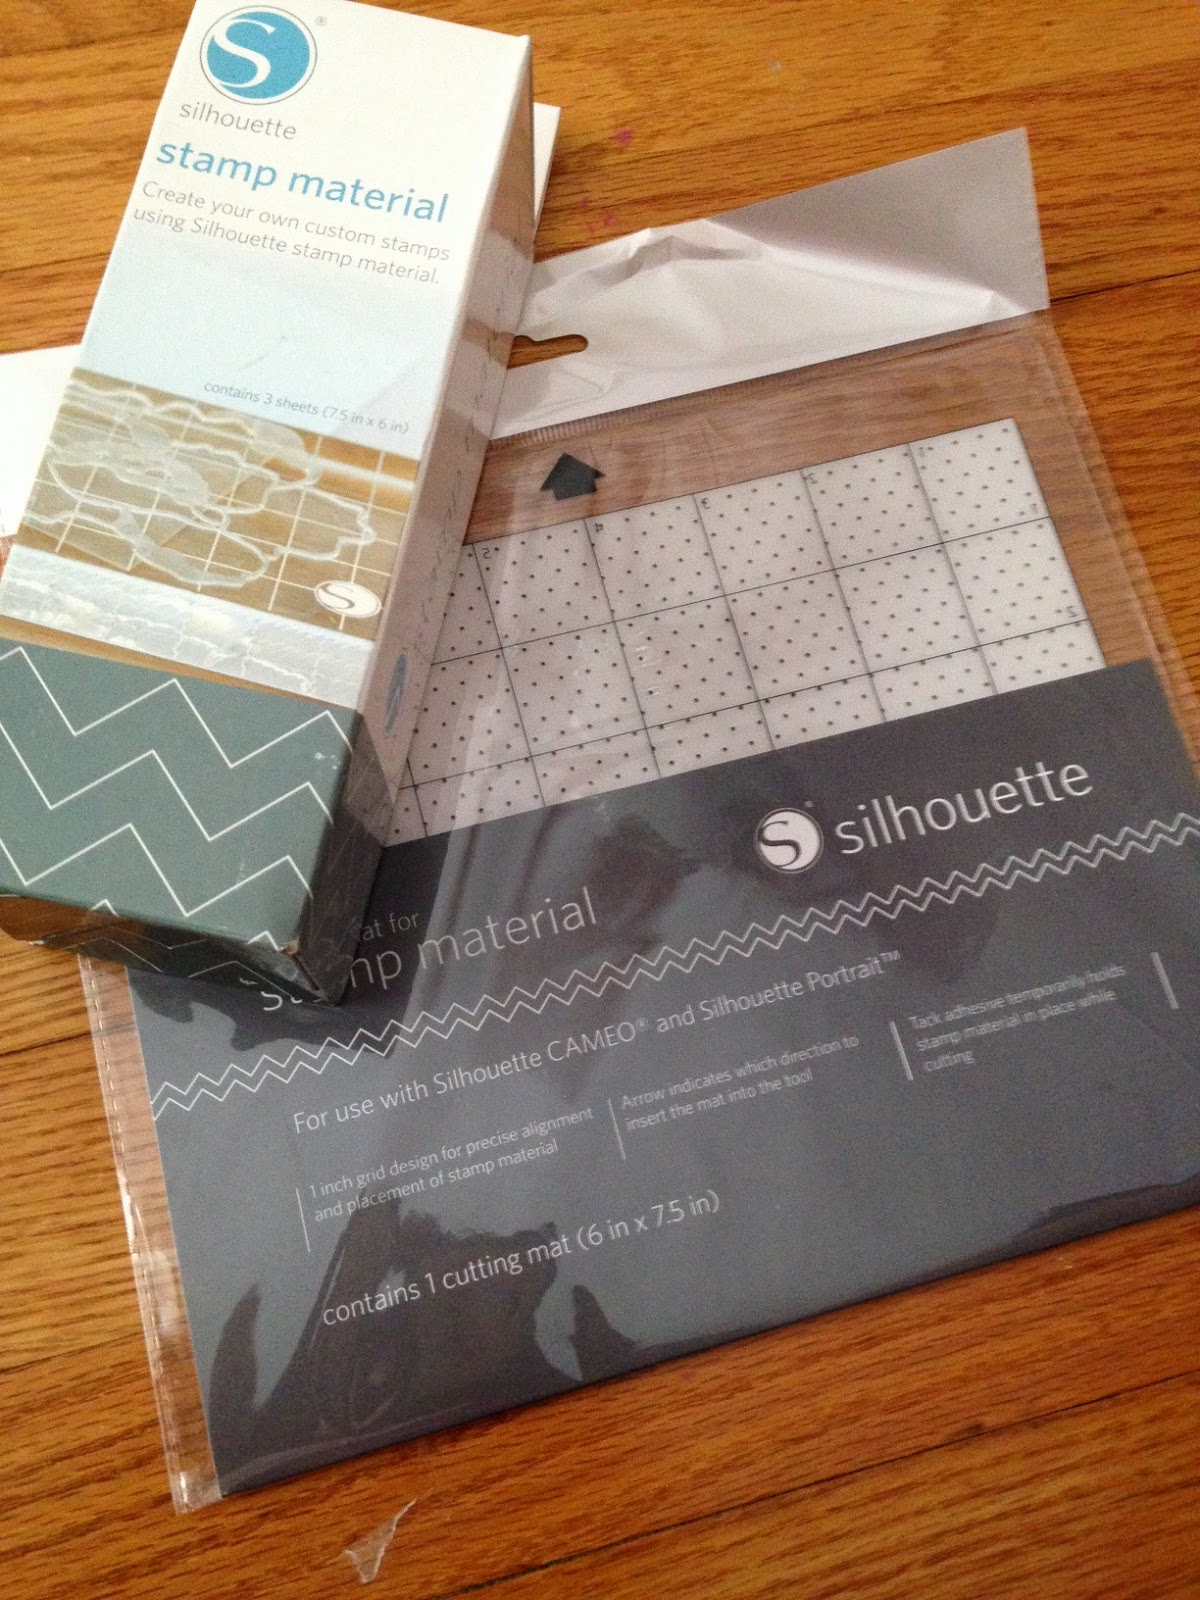 Silhouette, stamp, tutorial, beginners, material, mat